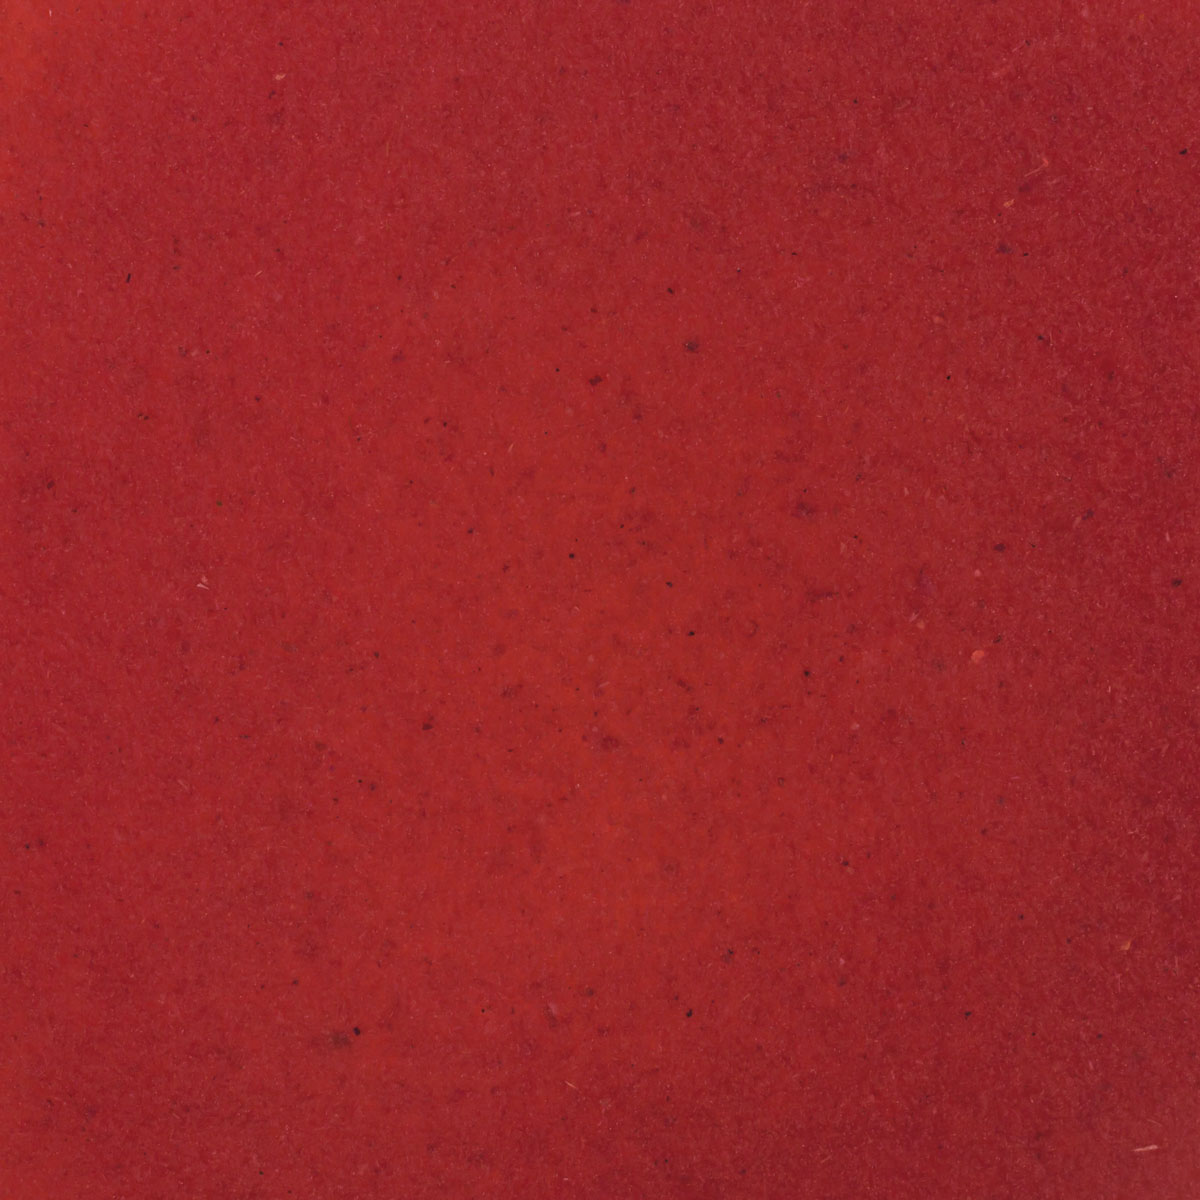 red grape pomace texture